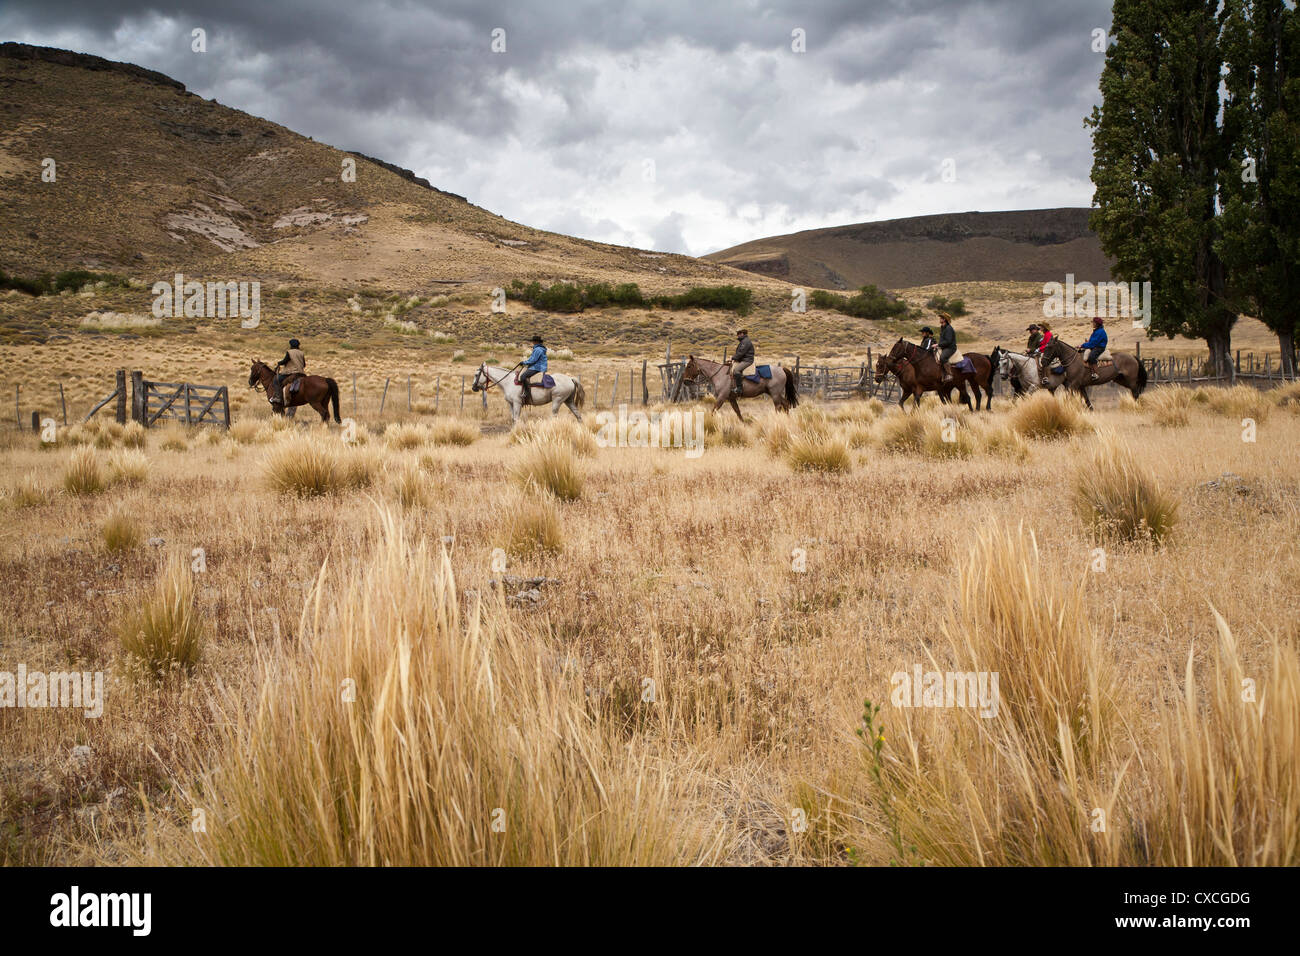 Horseback riding, Patagonia, Argentina. - Stock Image